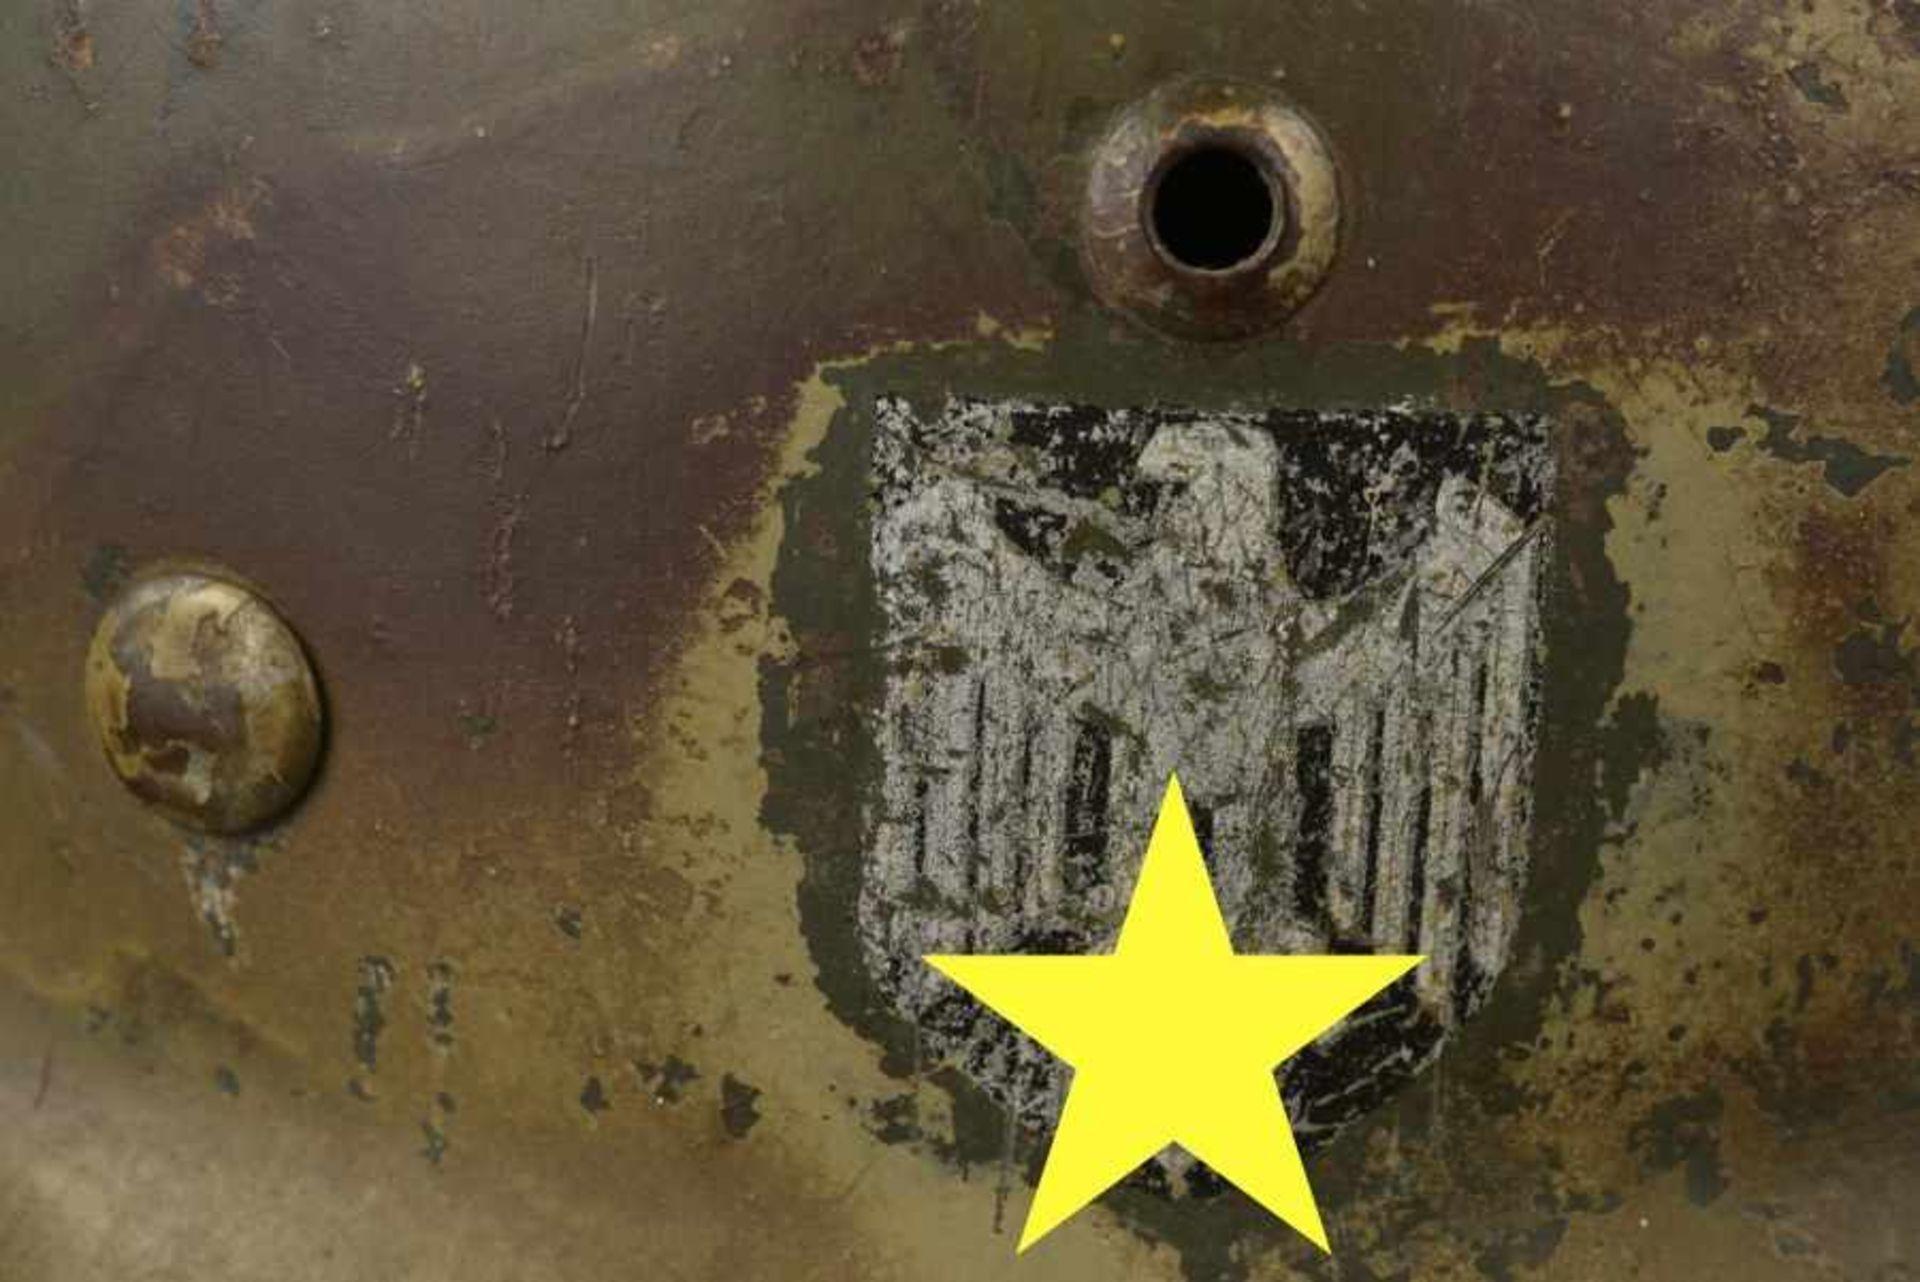 Casque camouflé de la Heer avec trace de grillage. Camouflage Heer helmet with burn marksCoque de - Bild 2 aus 4